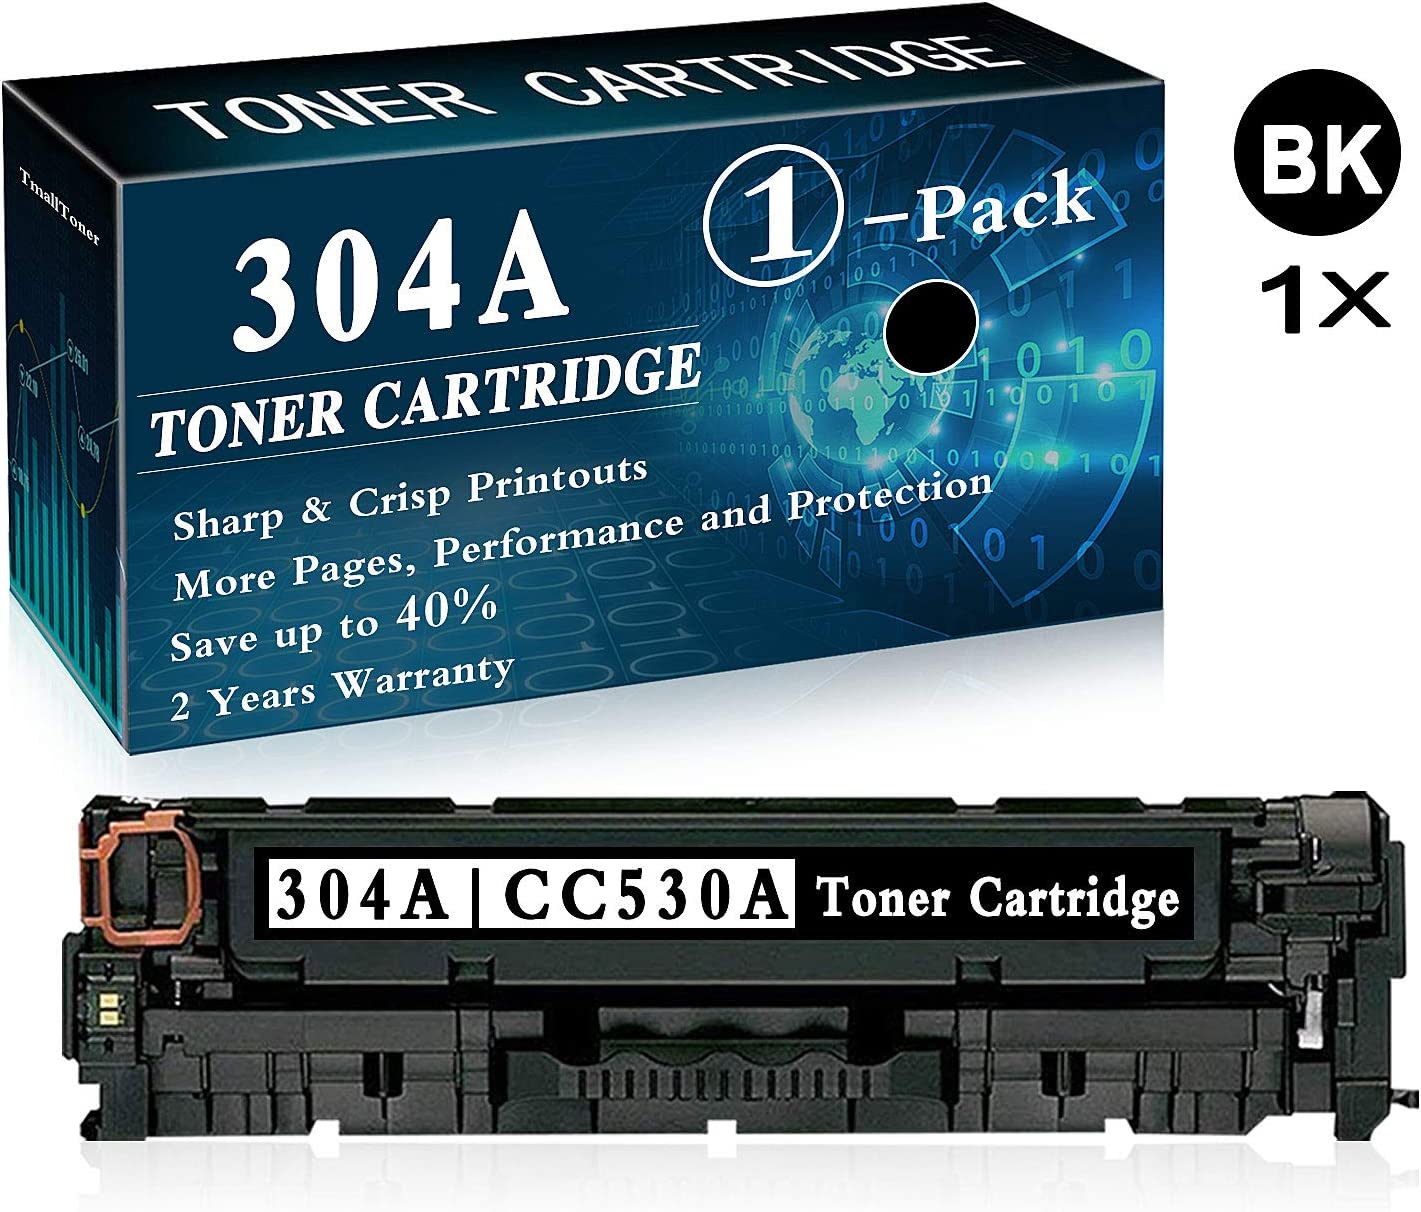 1 Pack Black 304A CC530A Remanufactured Toner Cartridge Replacement for HP Color Laserjet CP2025 CP2025n CP2025dn CP2025x CM2320n CM2320fxi CM2320nf MFP Printer Toner Cartridge